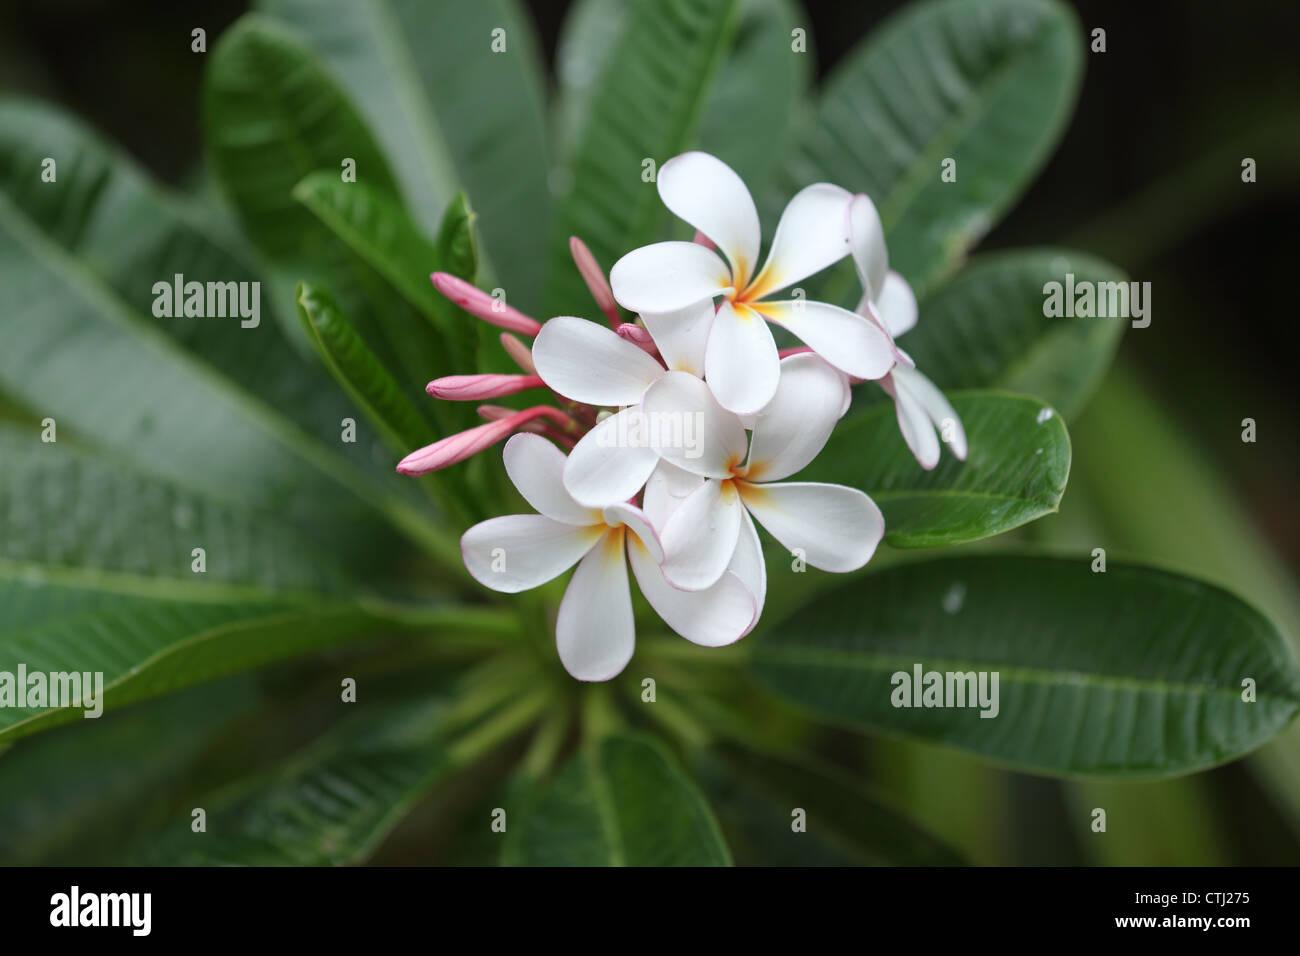 White plumeria flowers hawaii stock photo 49569385 alamy white plumeria flowers hawaii izmirmasajfo